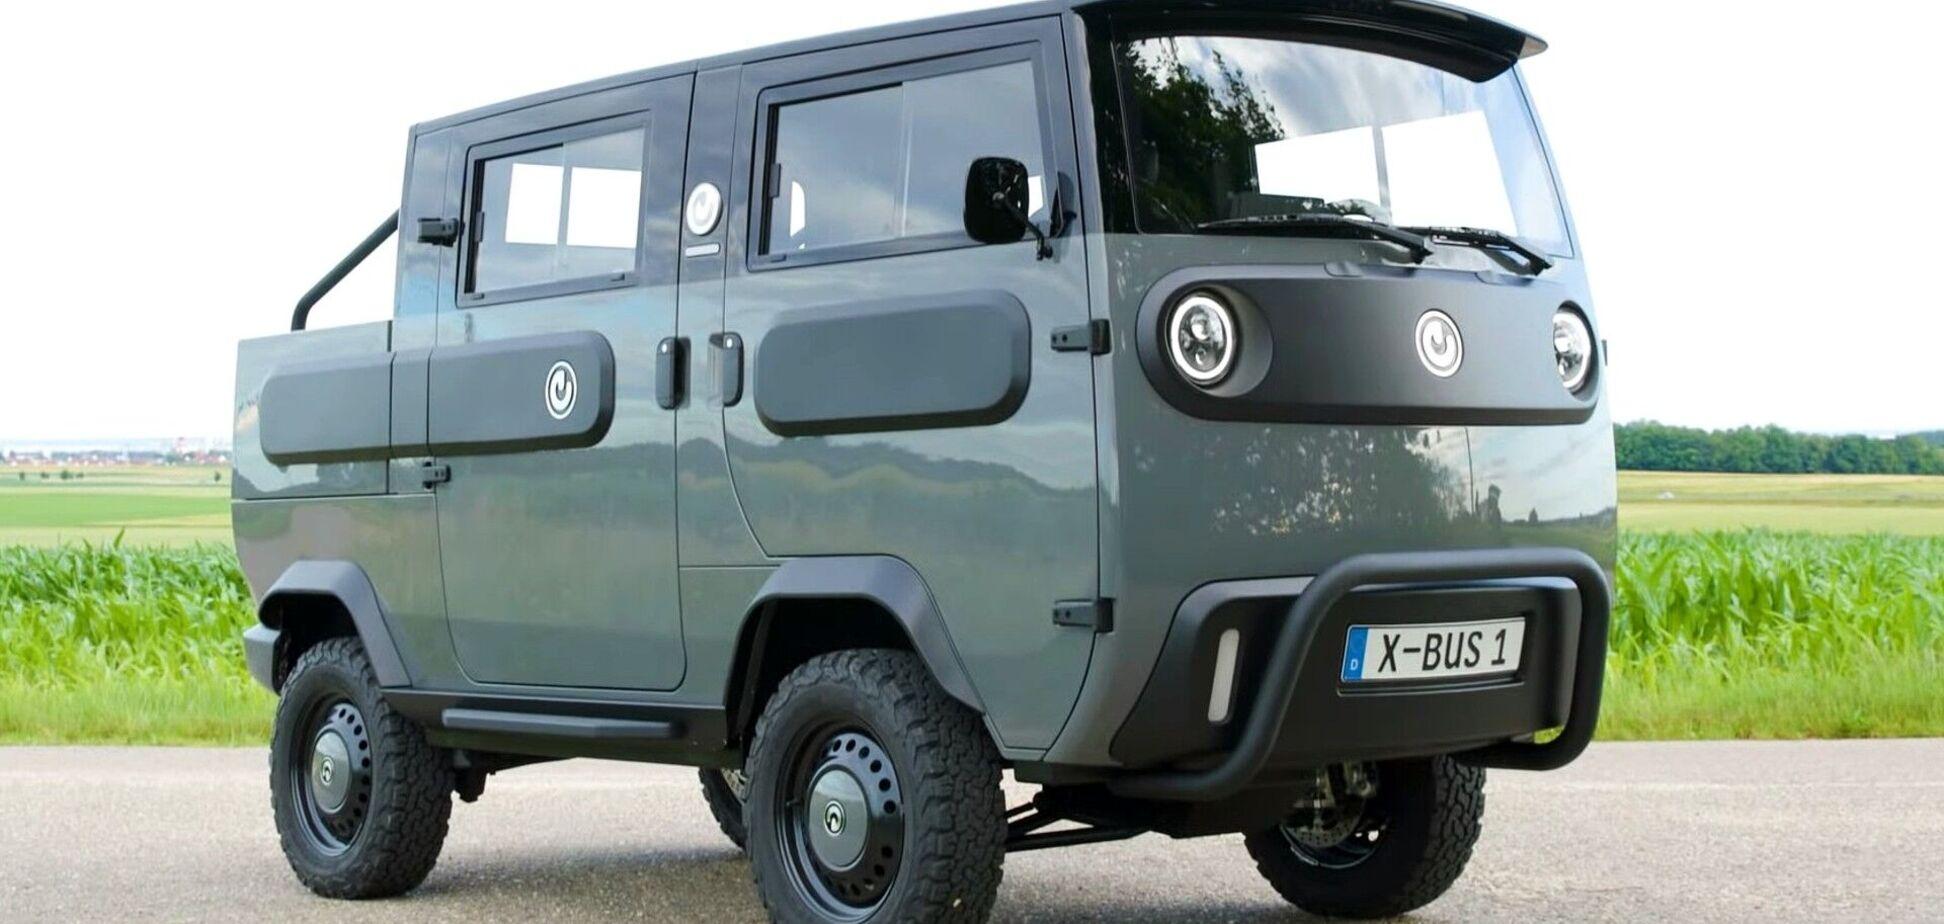 Стартап ElectricBrands показал яркий прототип XBUS